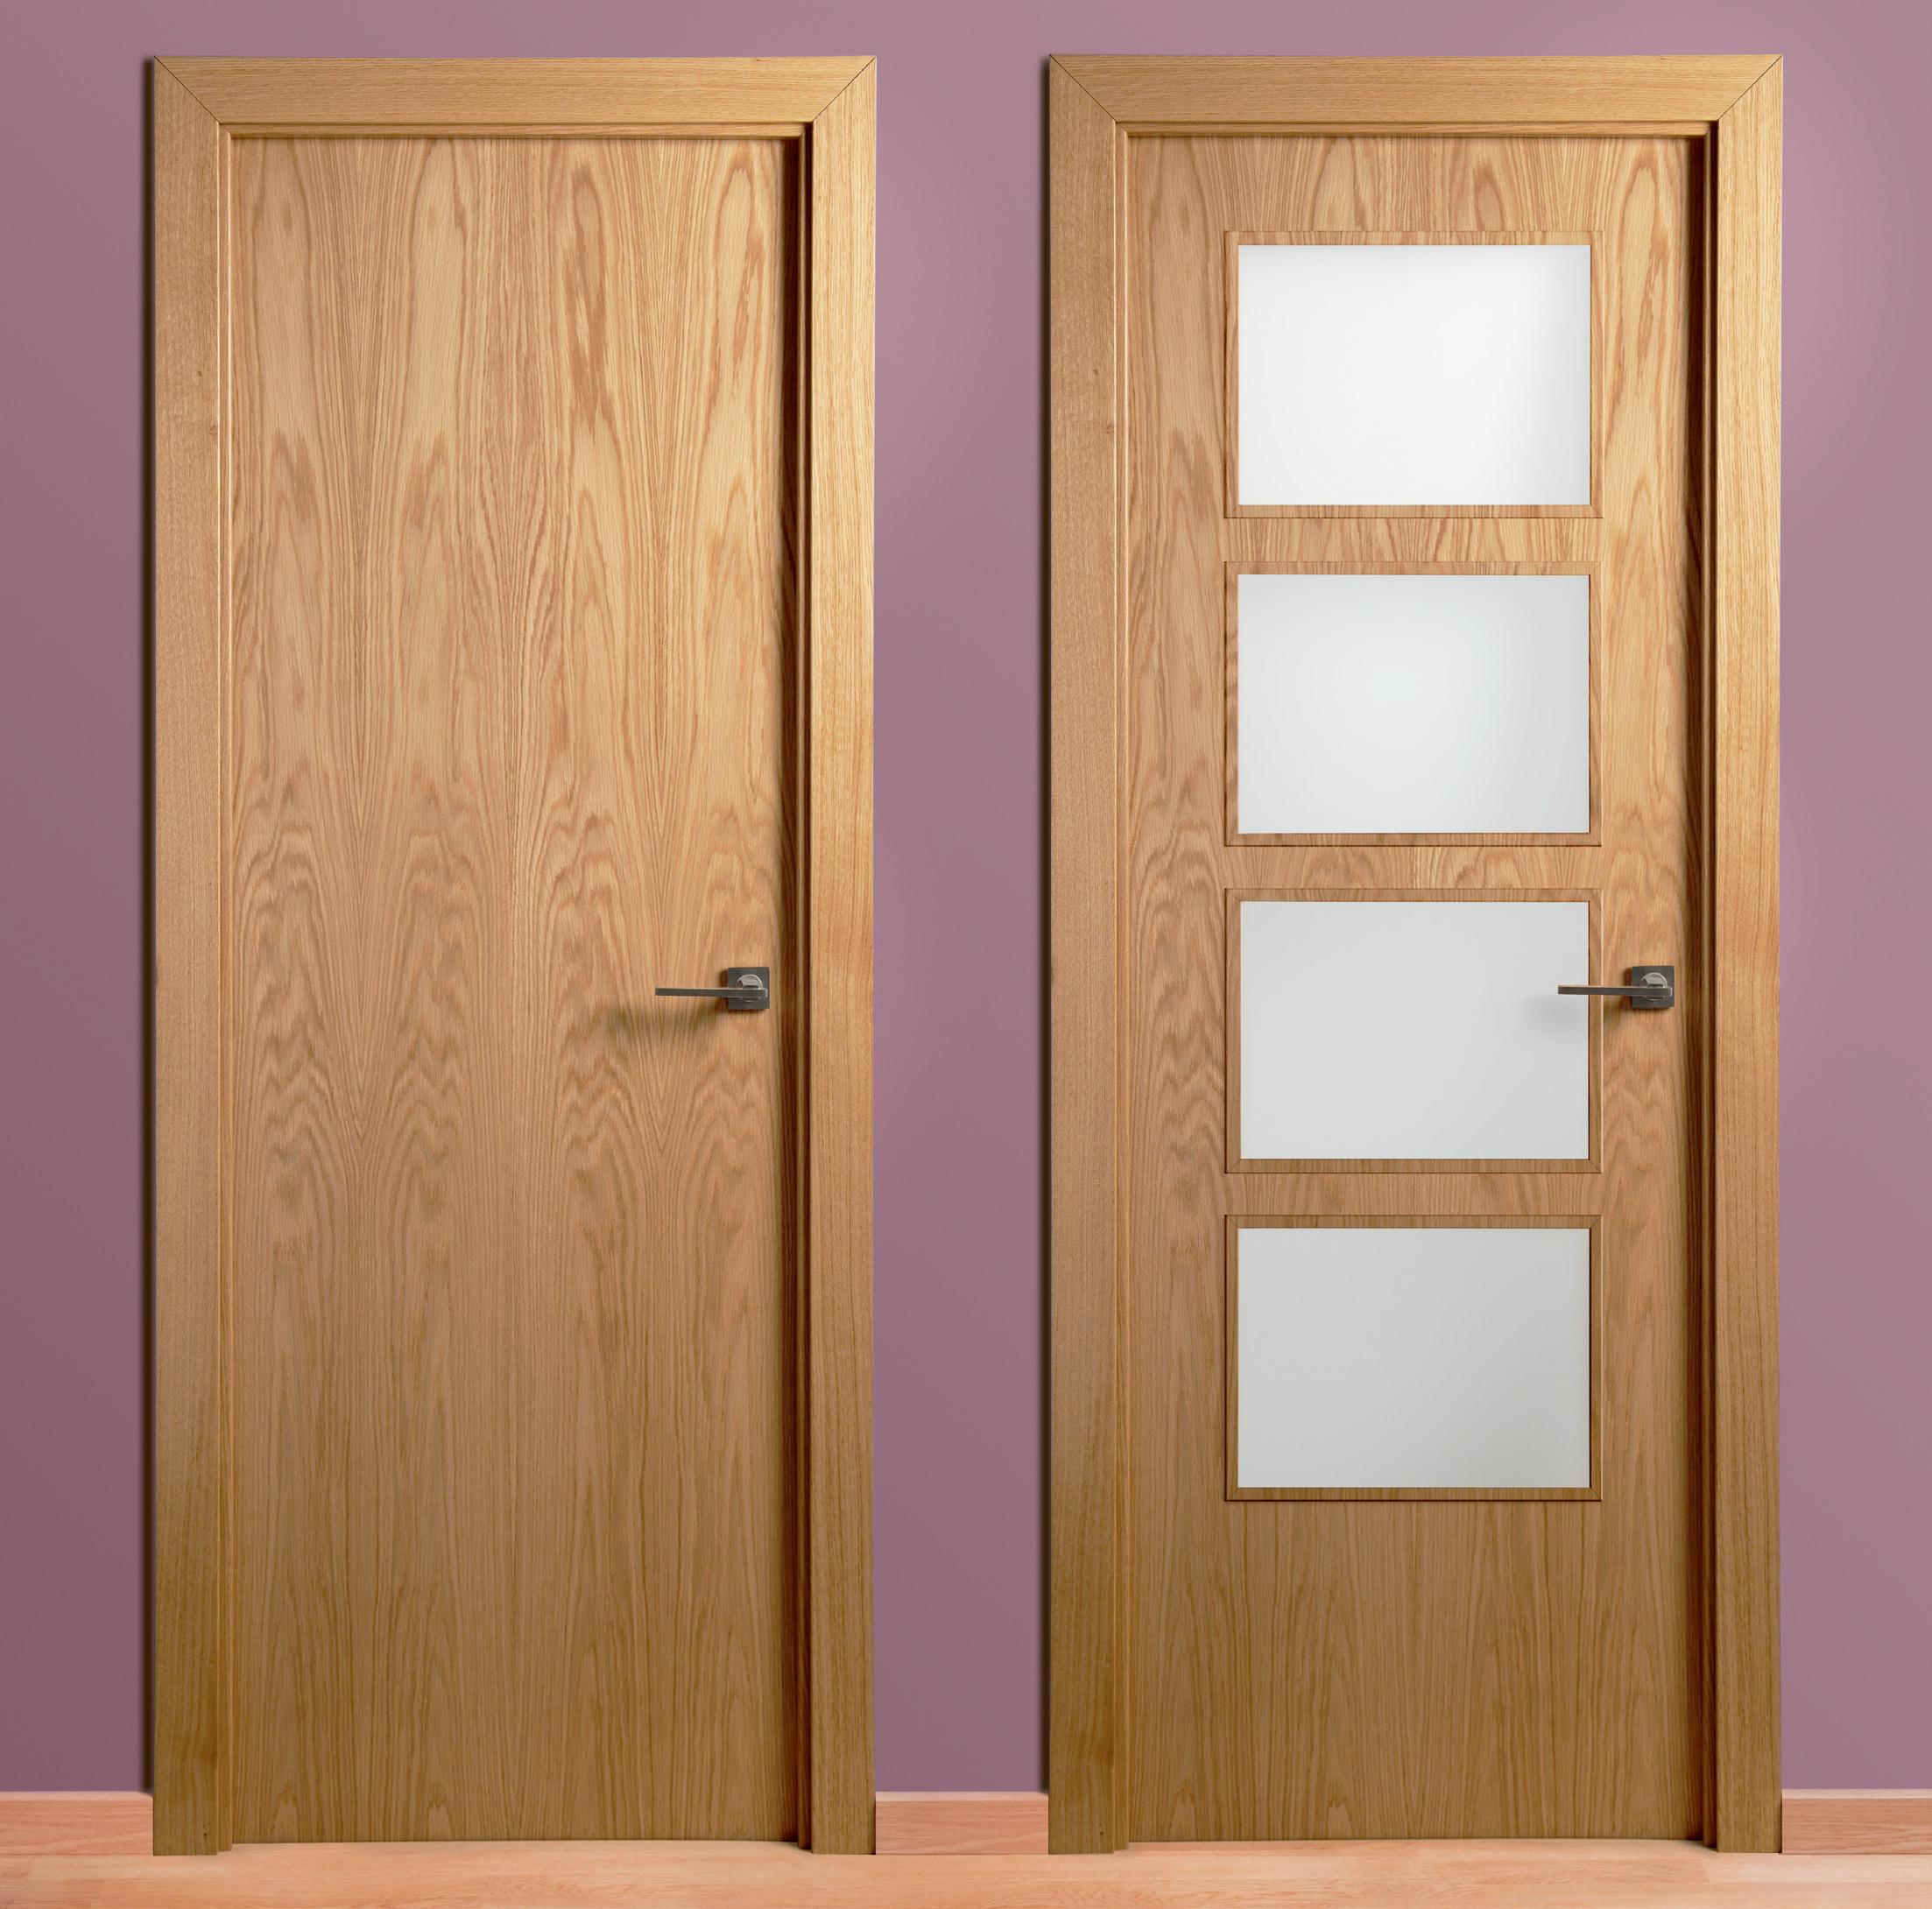 Puertas cocinas anman for Puertas de roble interior